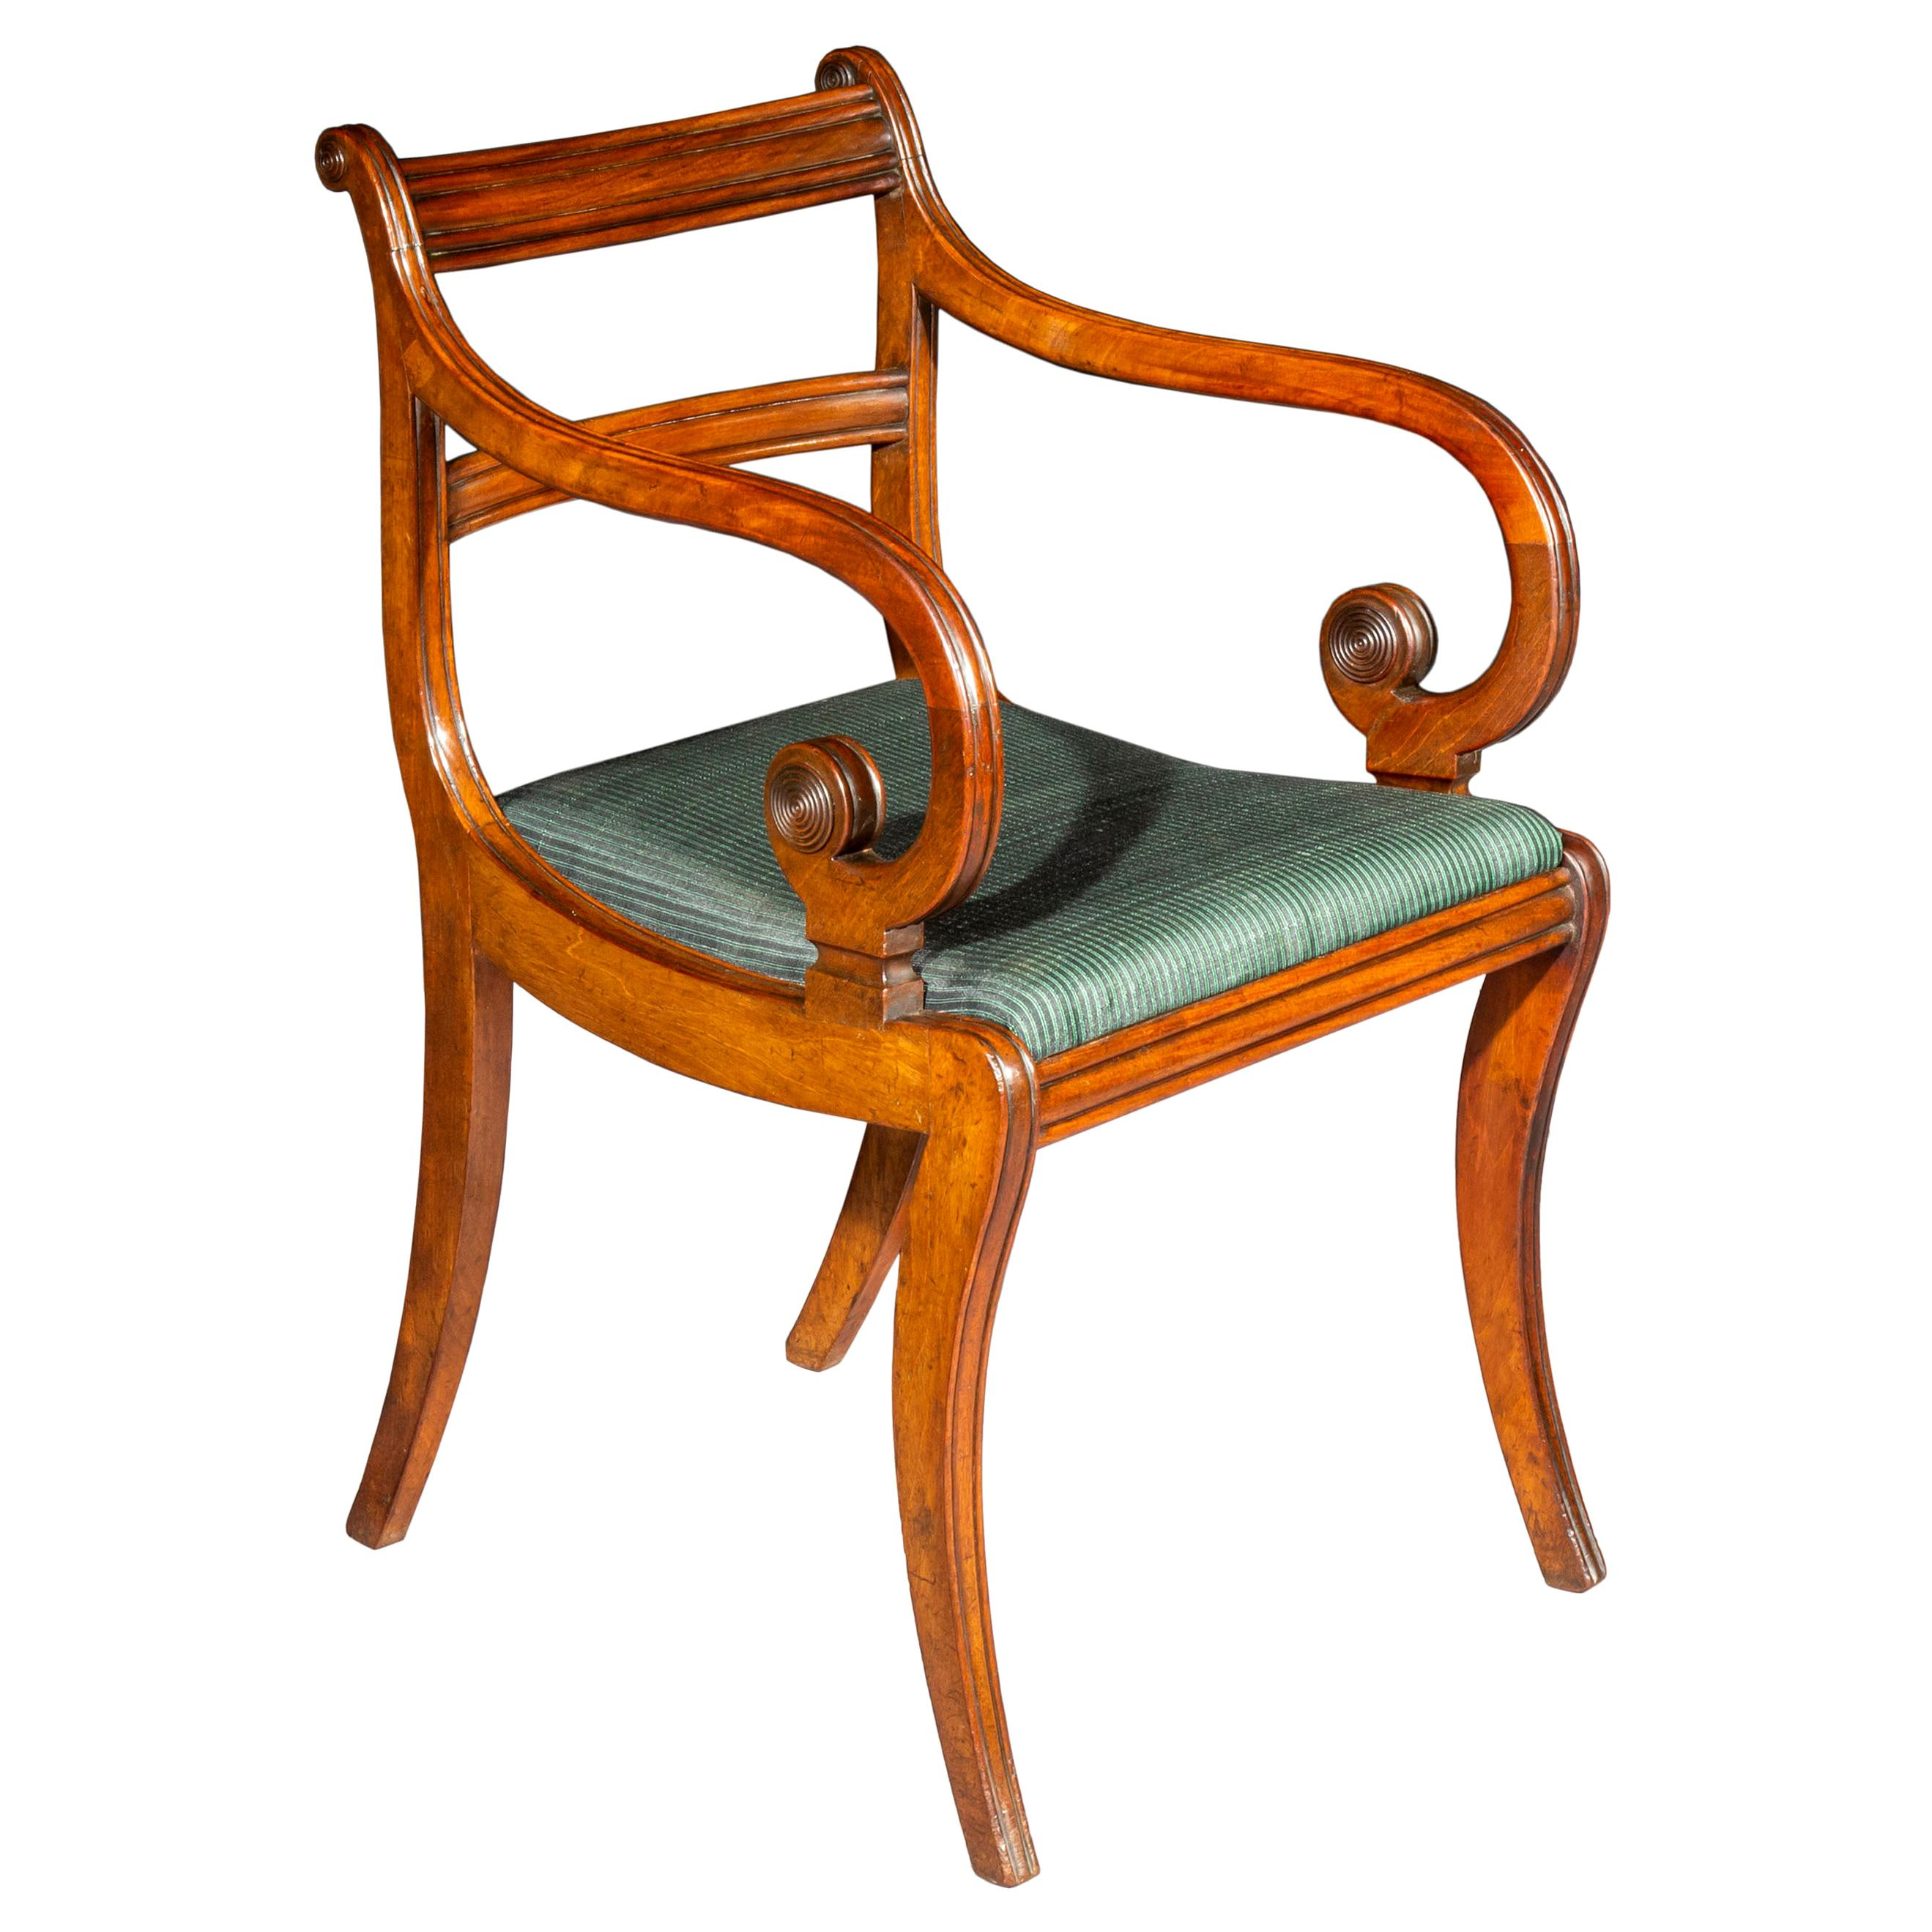 Antique Regency Klismos Desk Chair